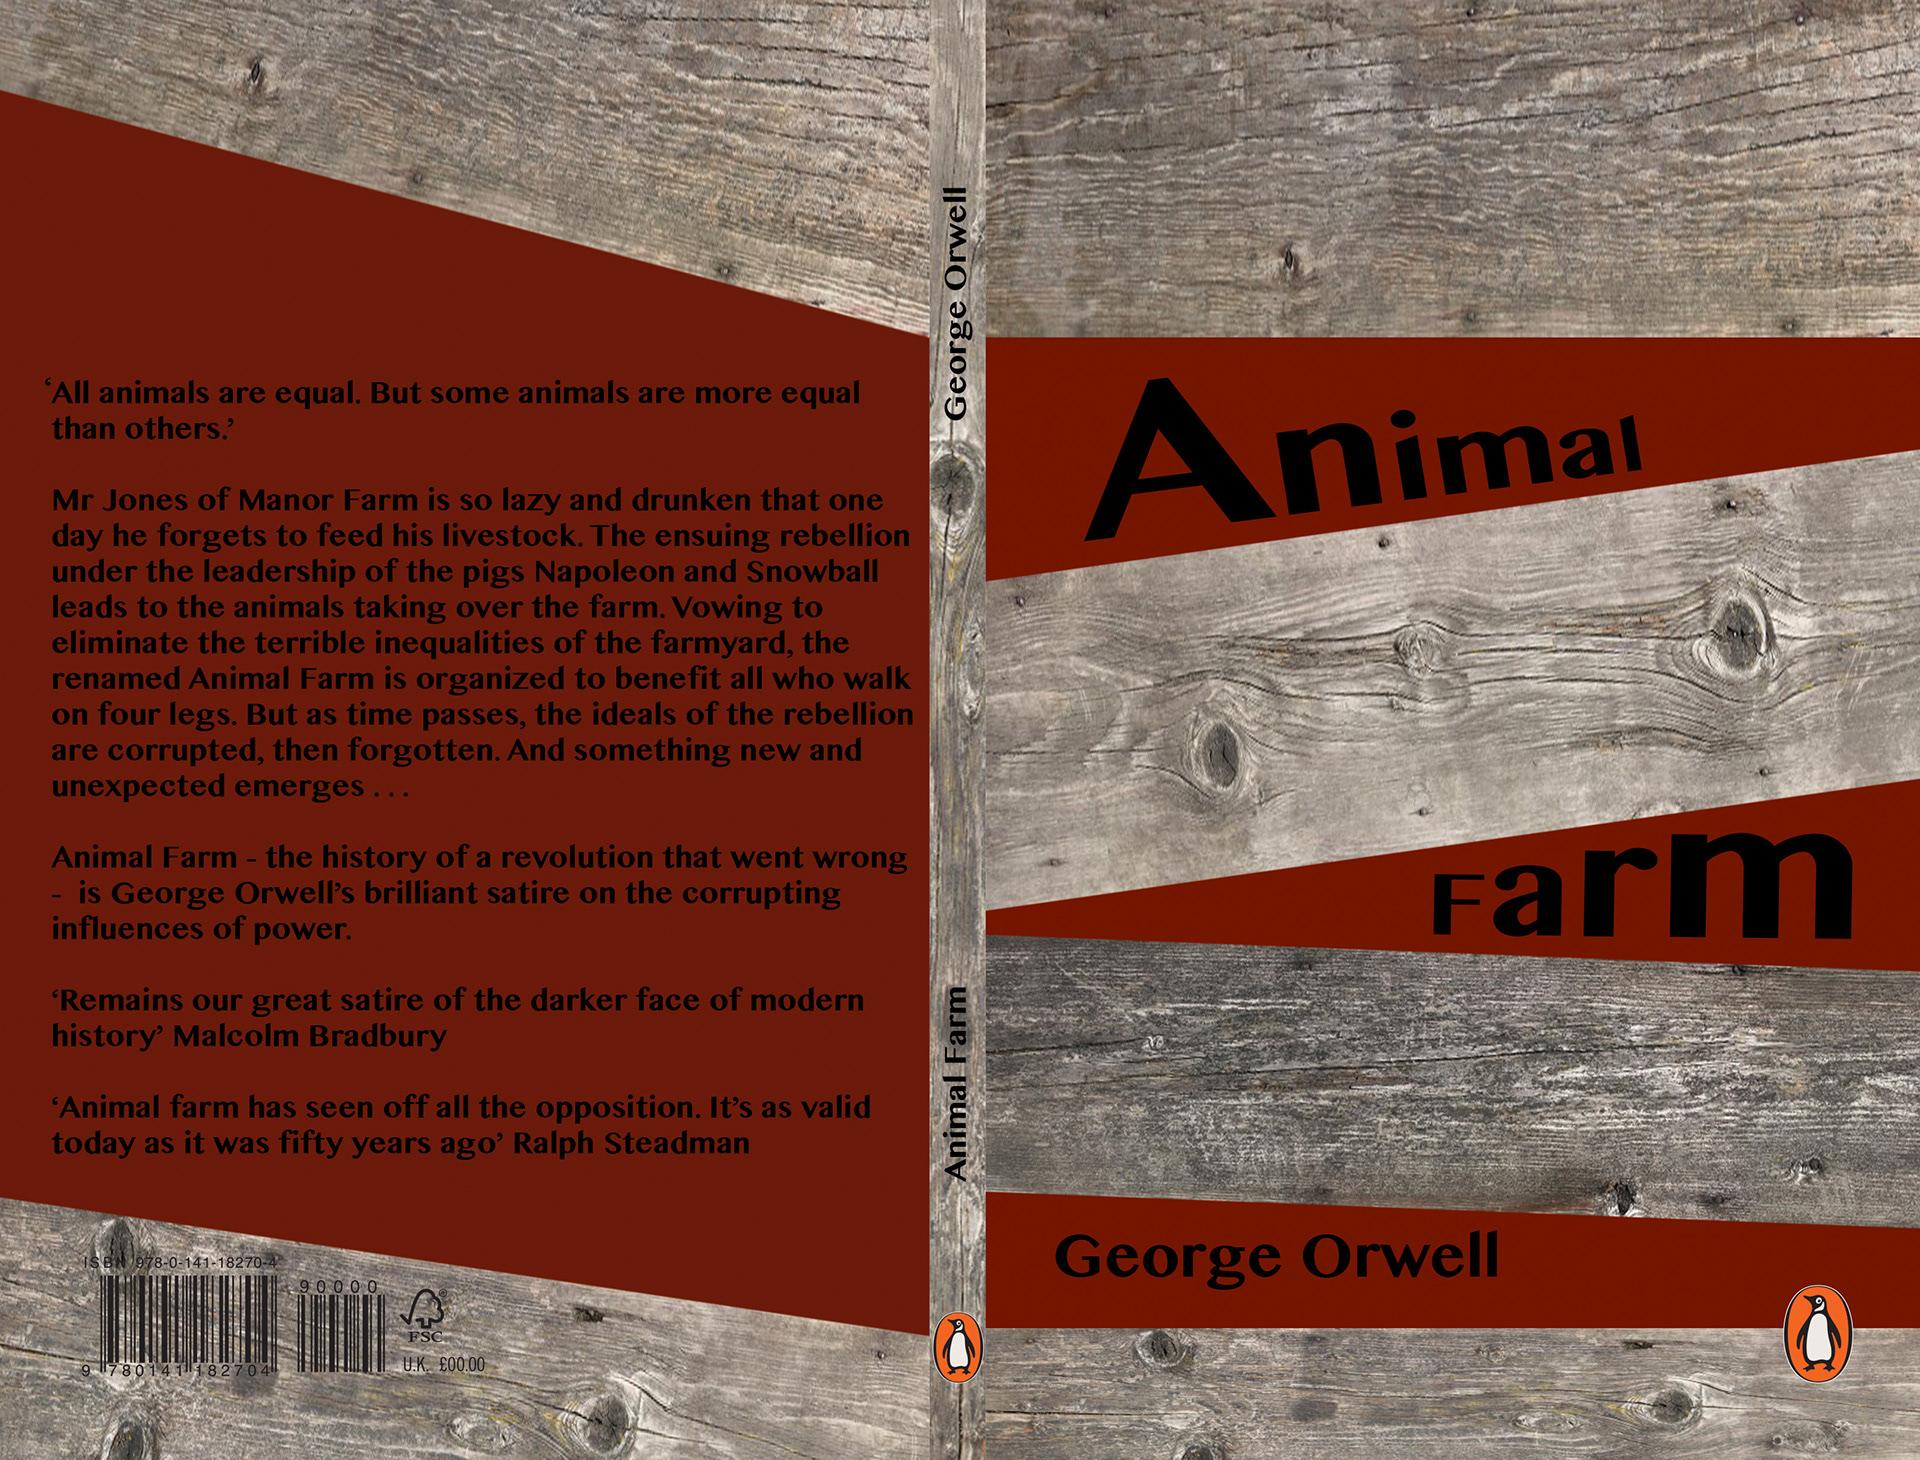 Mary Harutiunian Penguin Book Cover